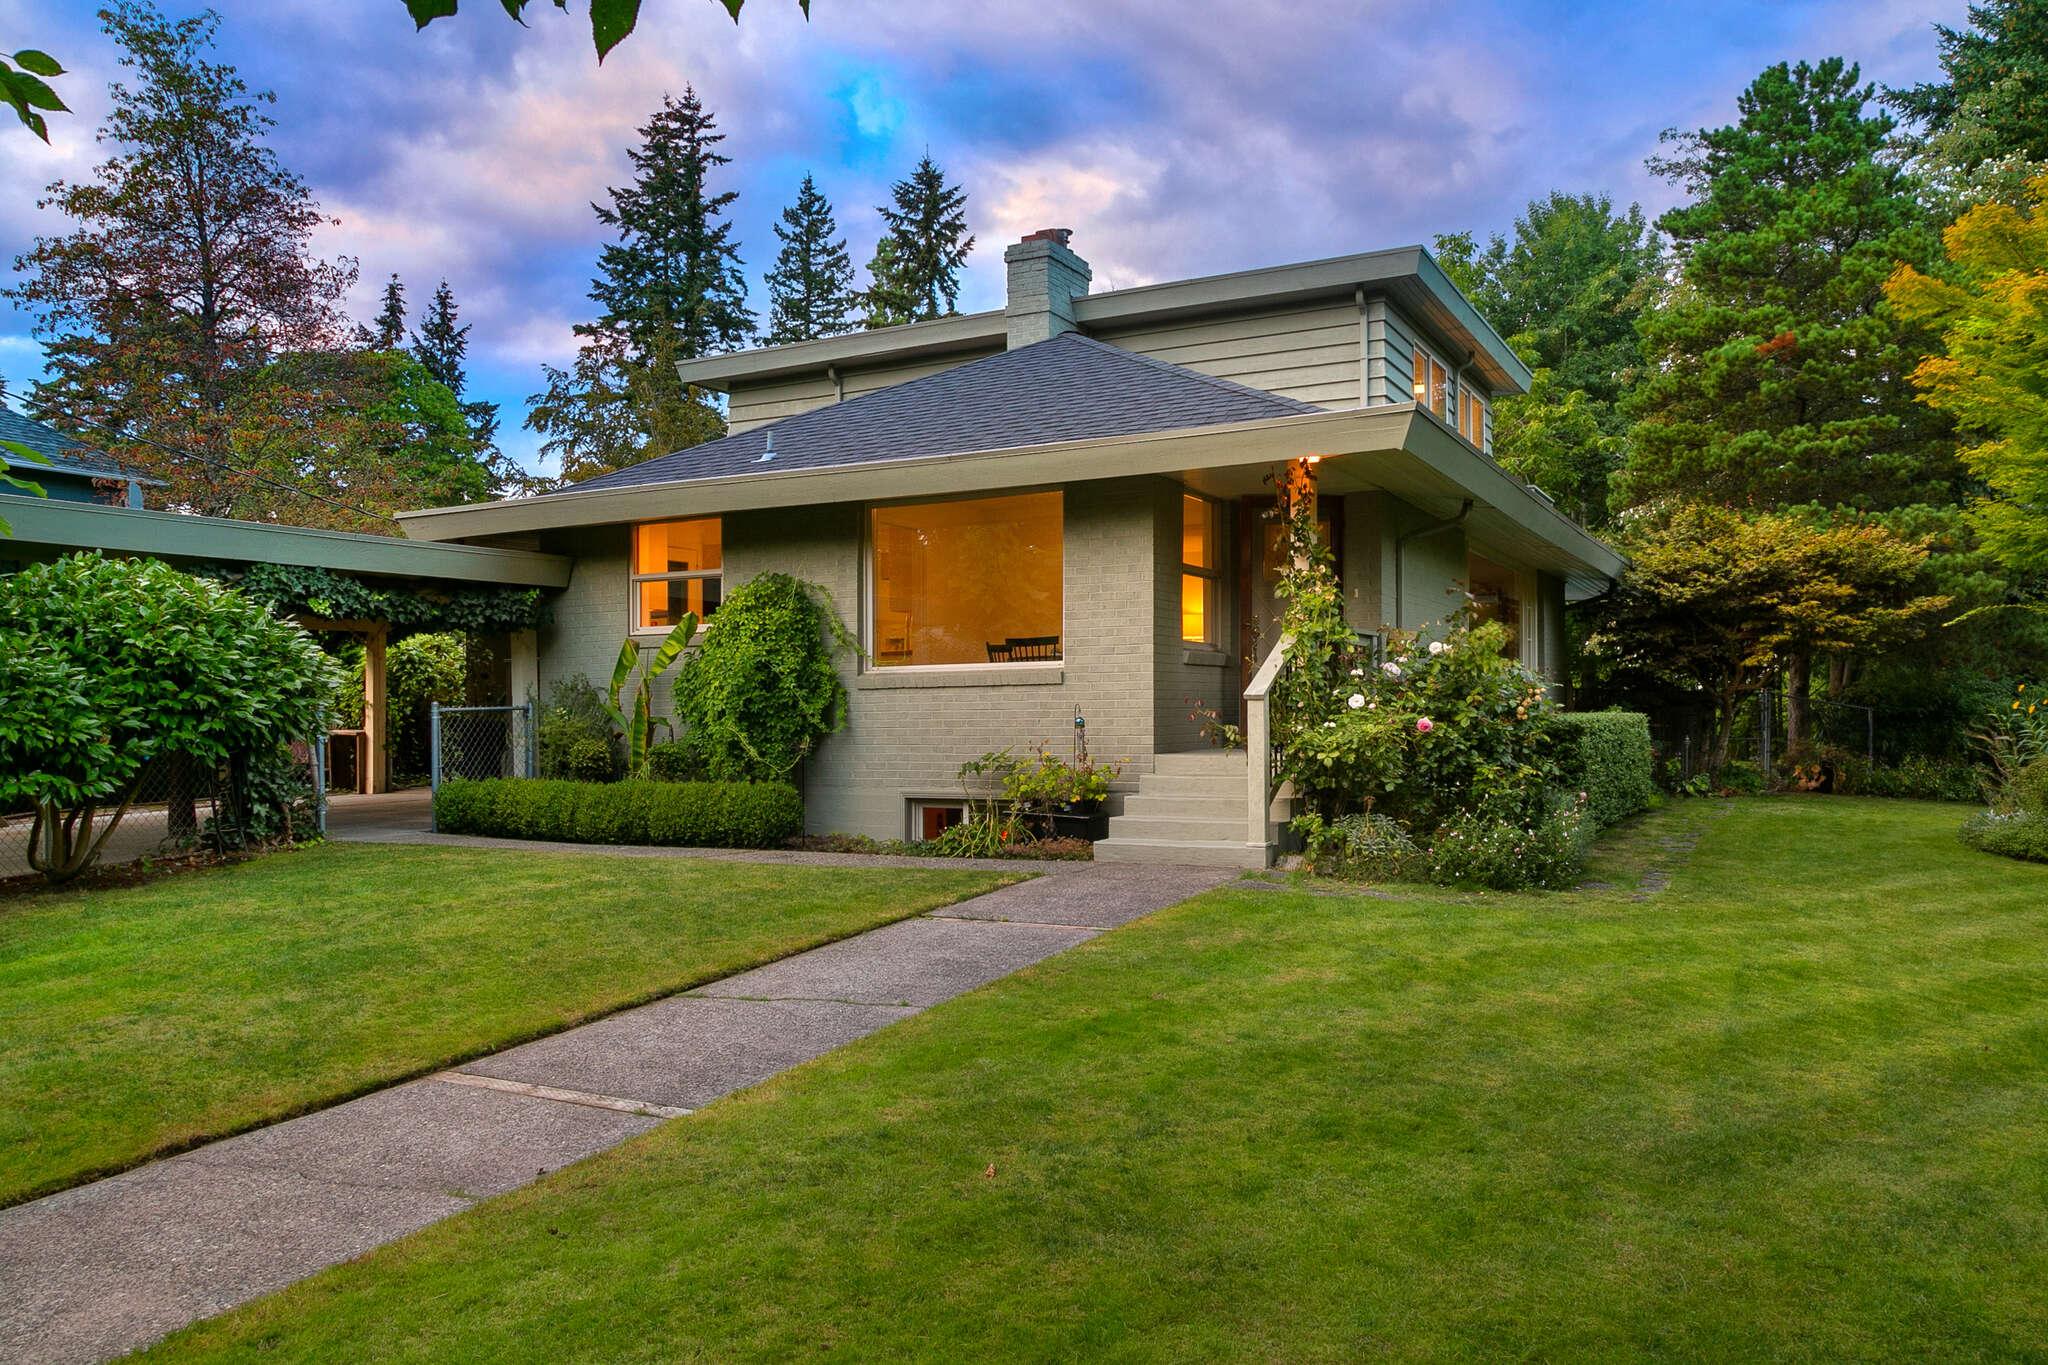 Single Family for Sale at 2240 NE 175th Street Shoreline, Washington 98155 United States